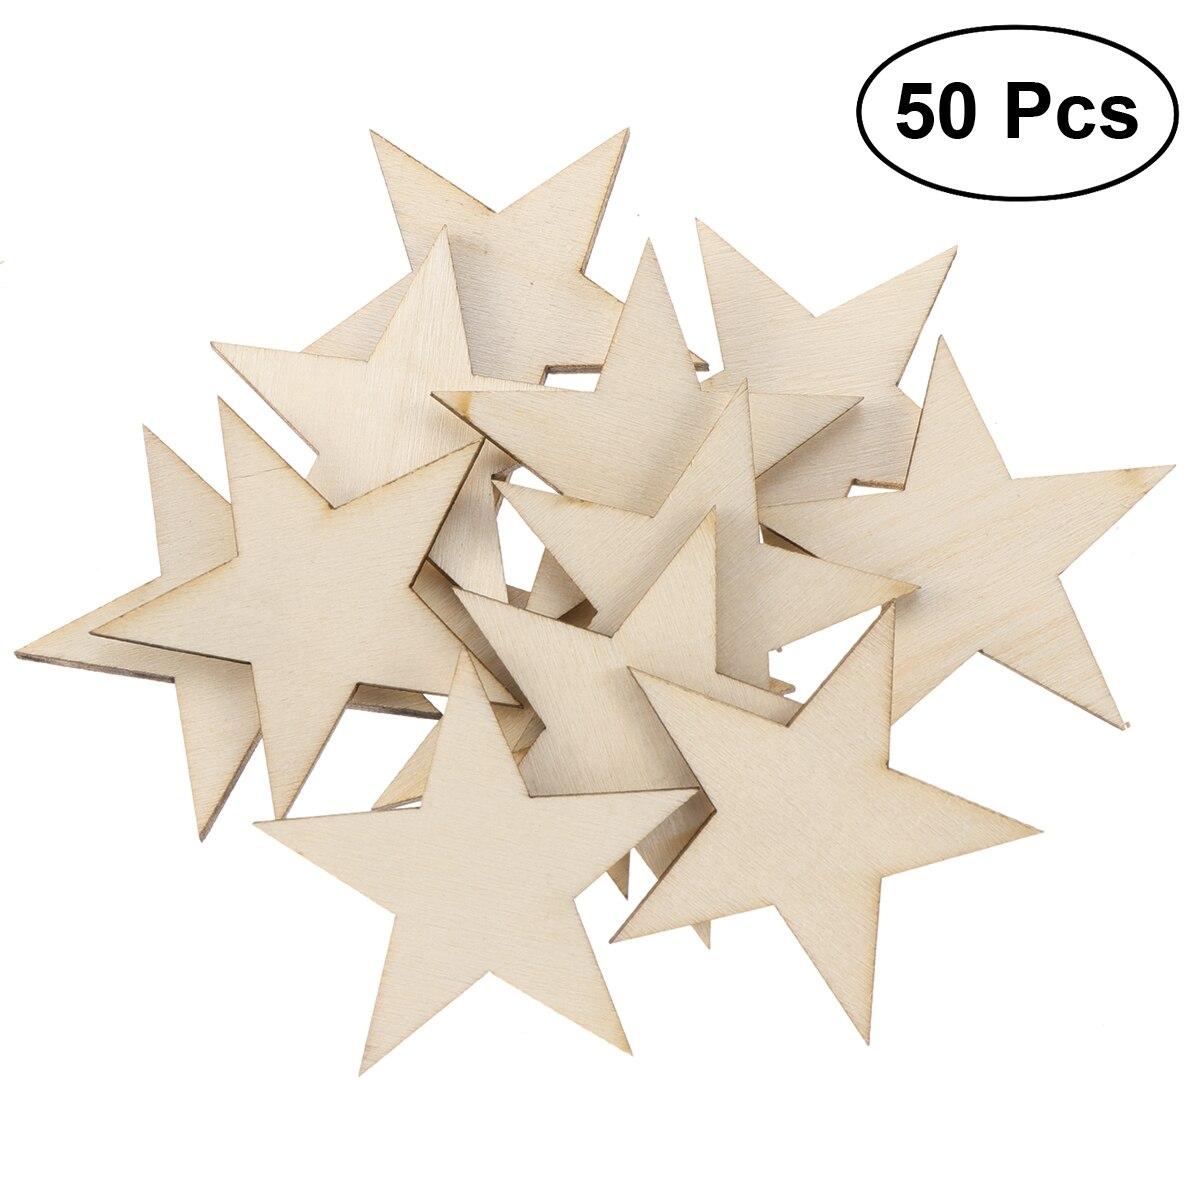 Diy Wood Crafts 50 Pcs Unfinished Star Shape Wood Cutout